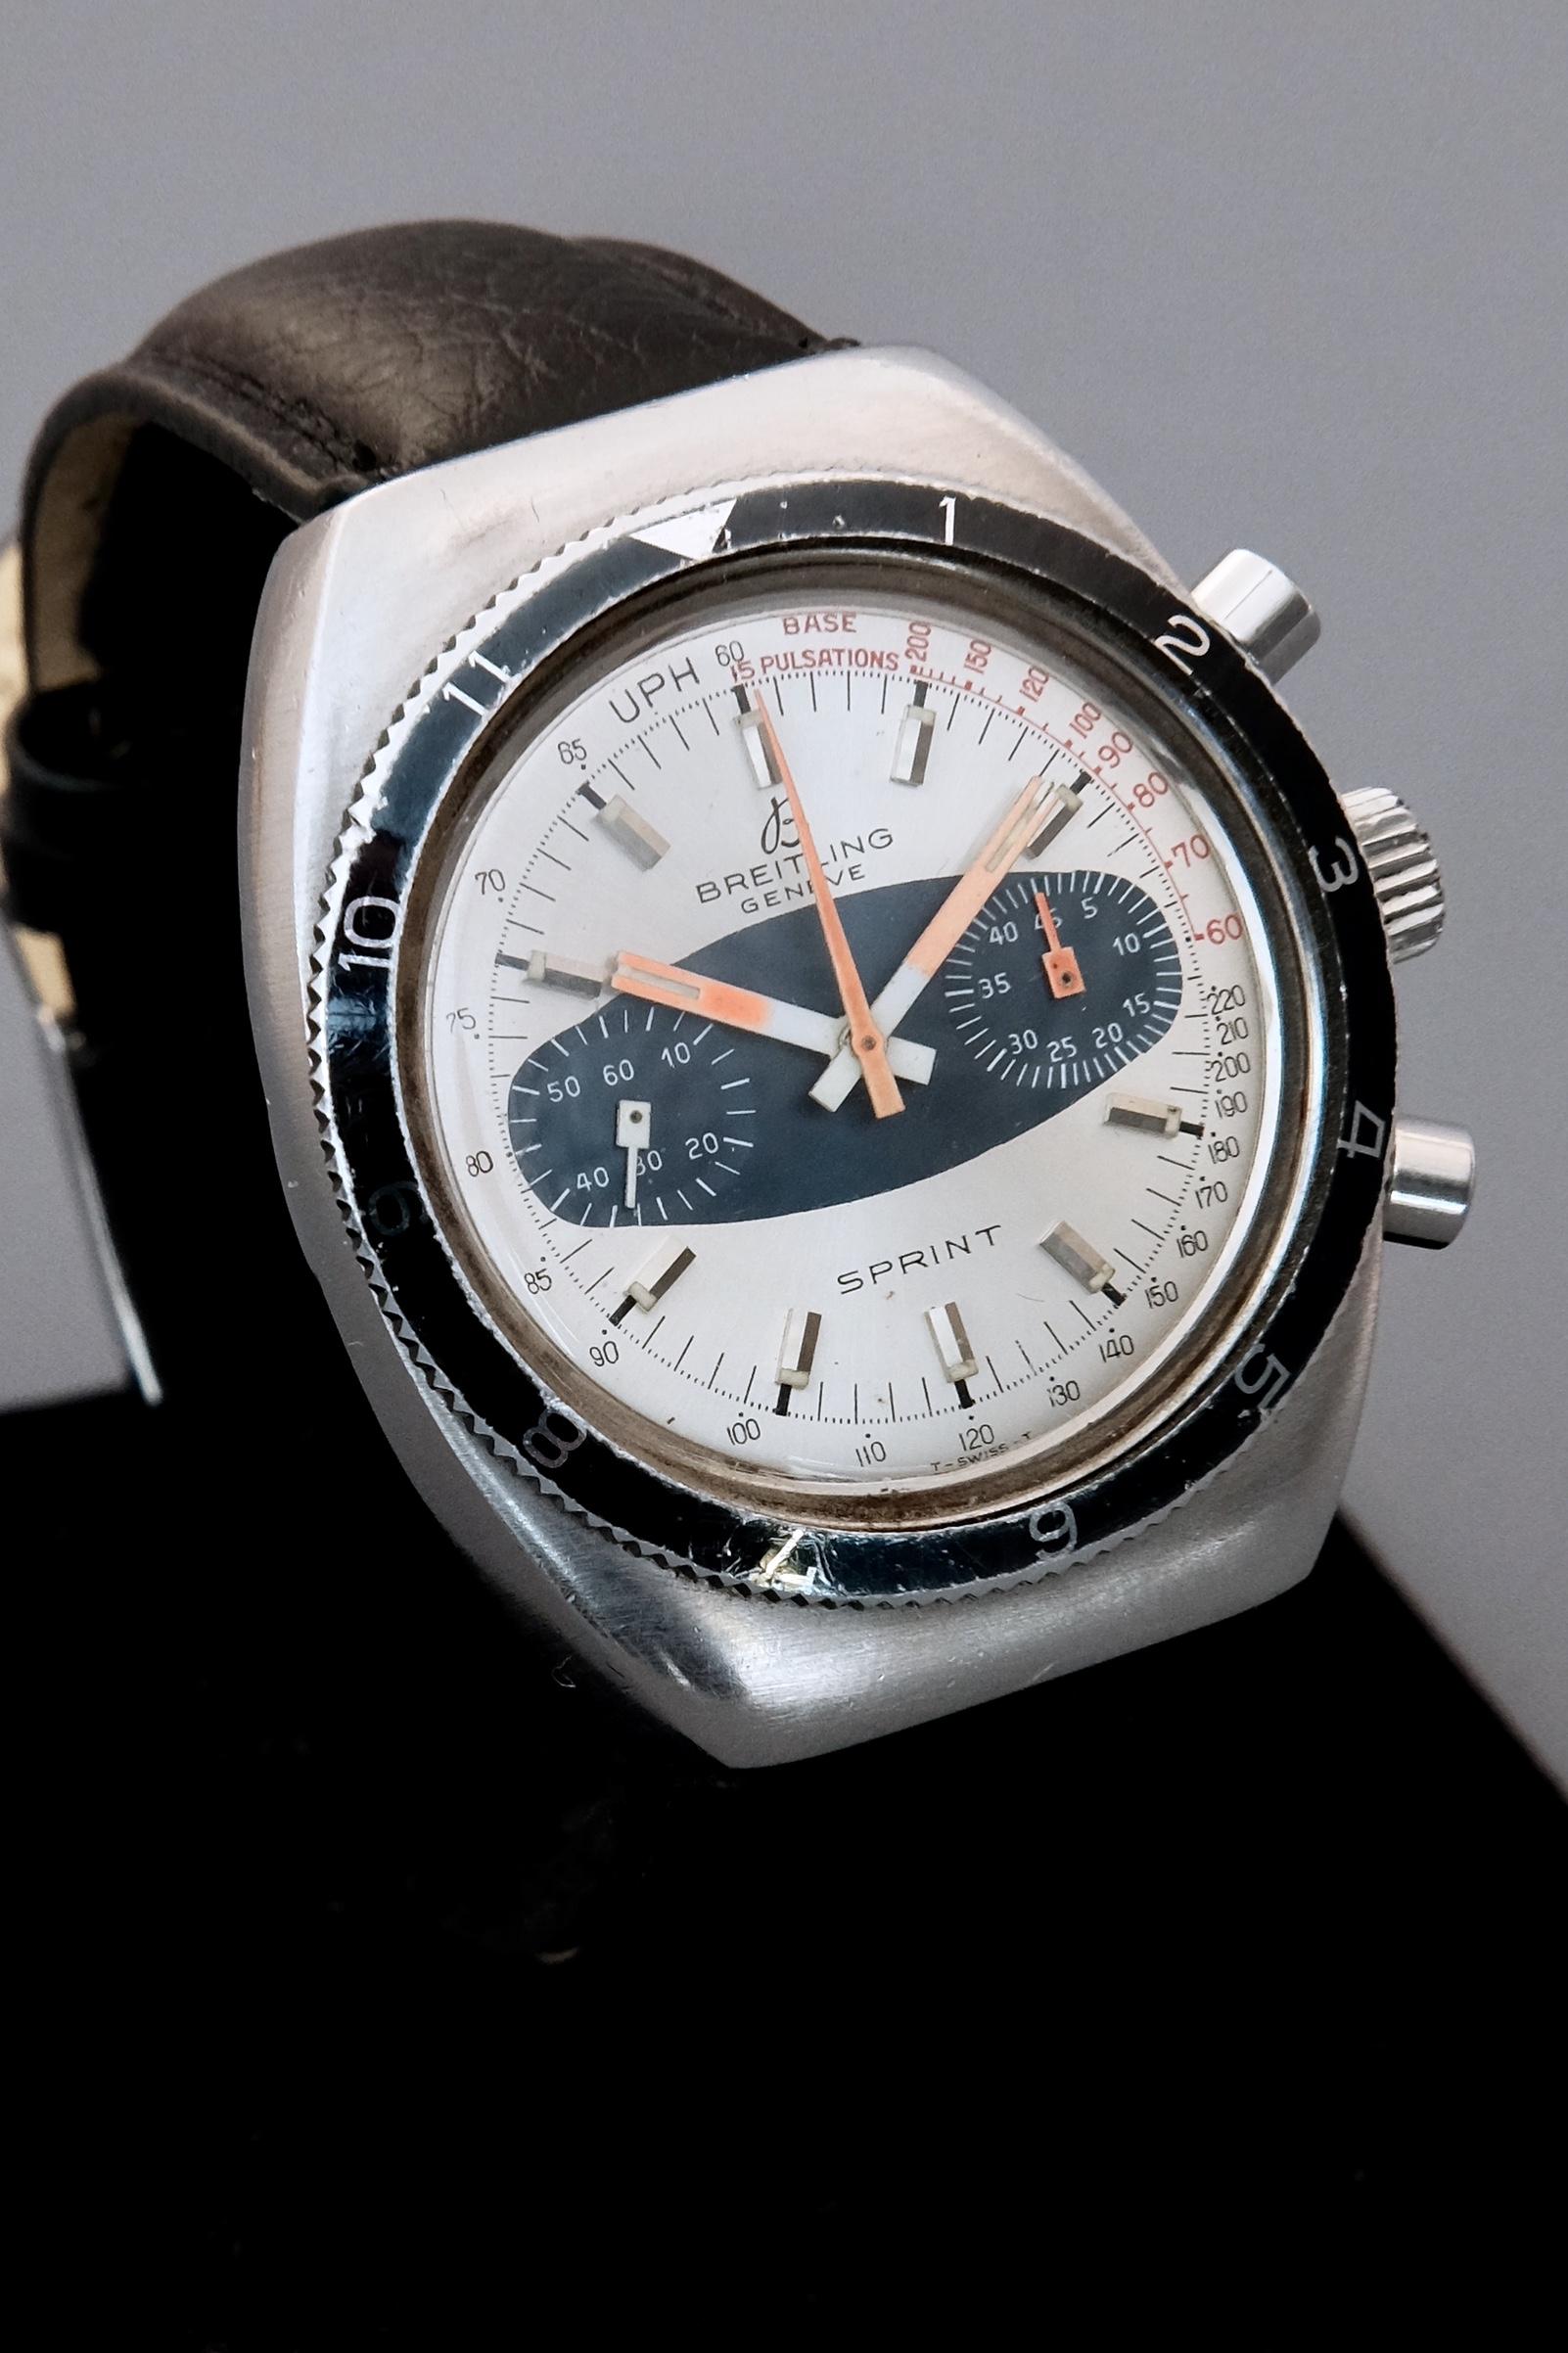 Breitling Sprint Chronograph